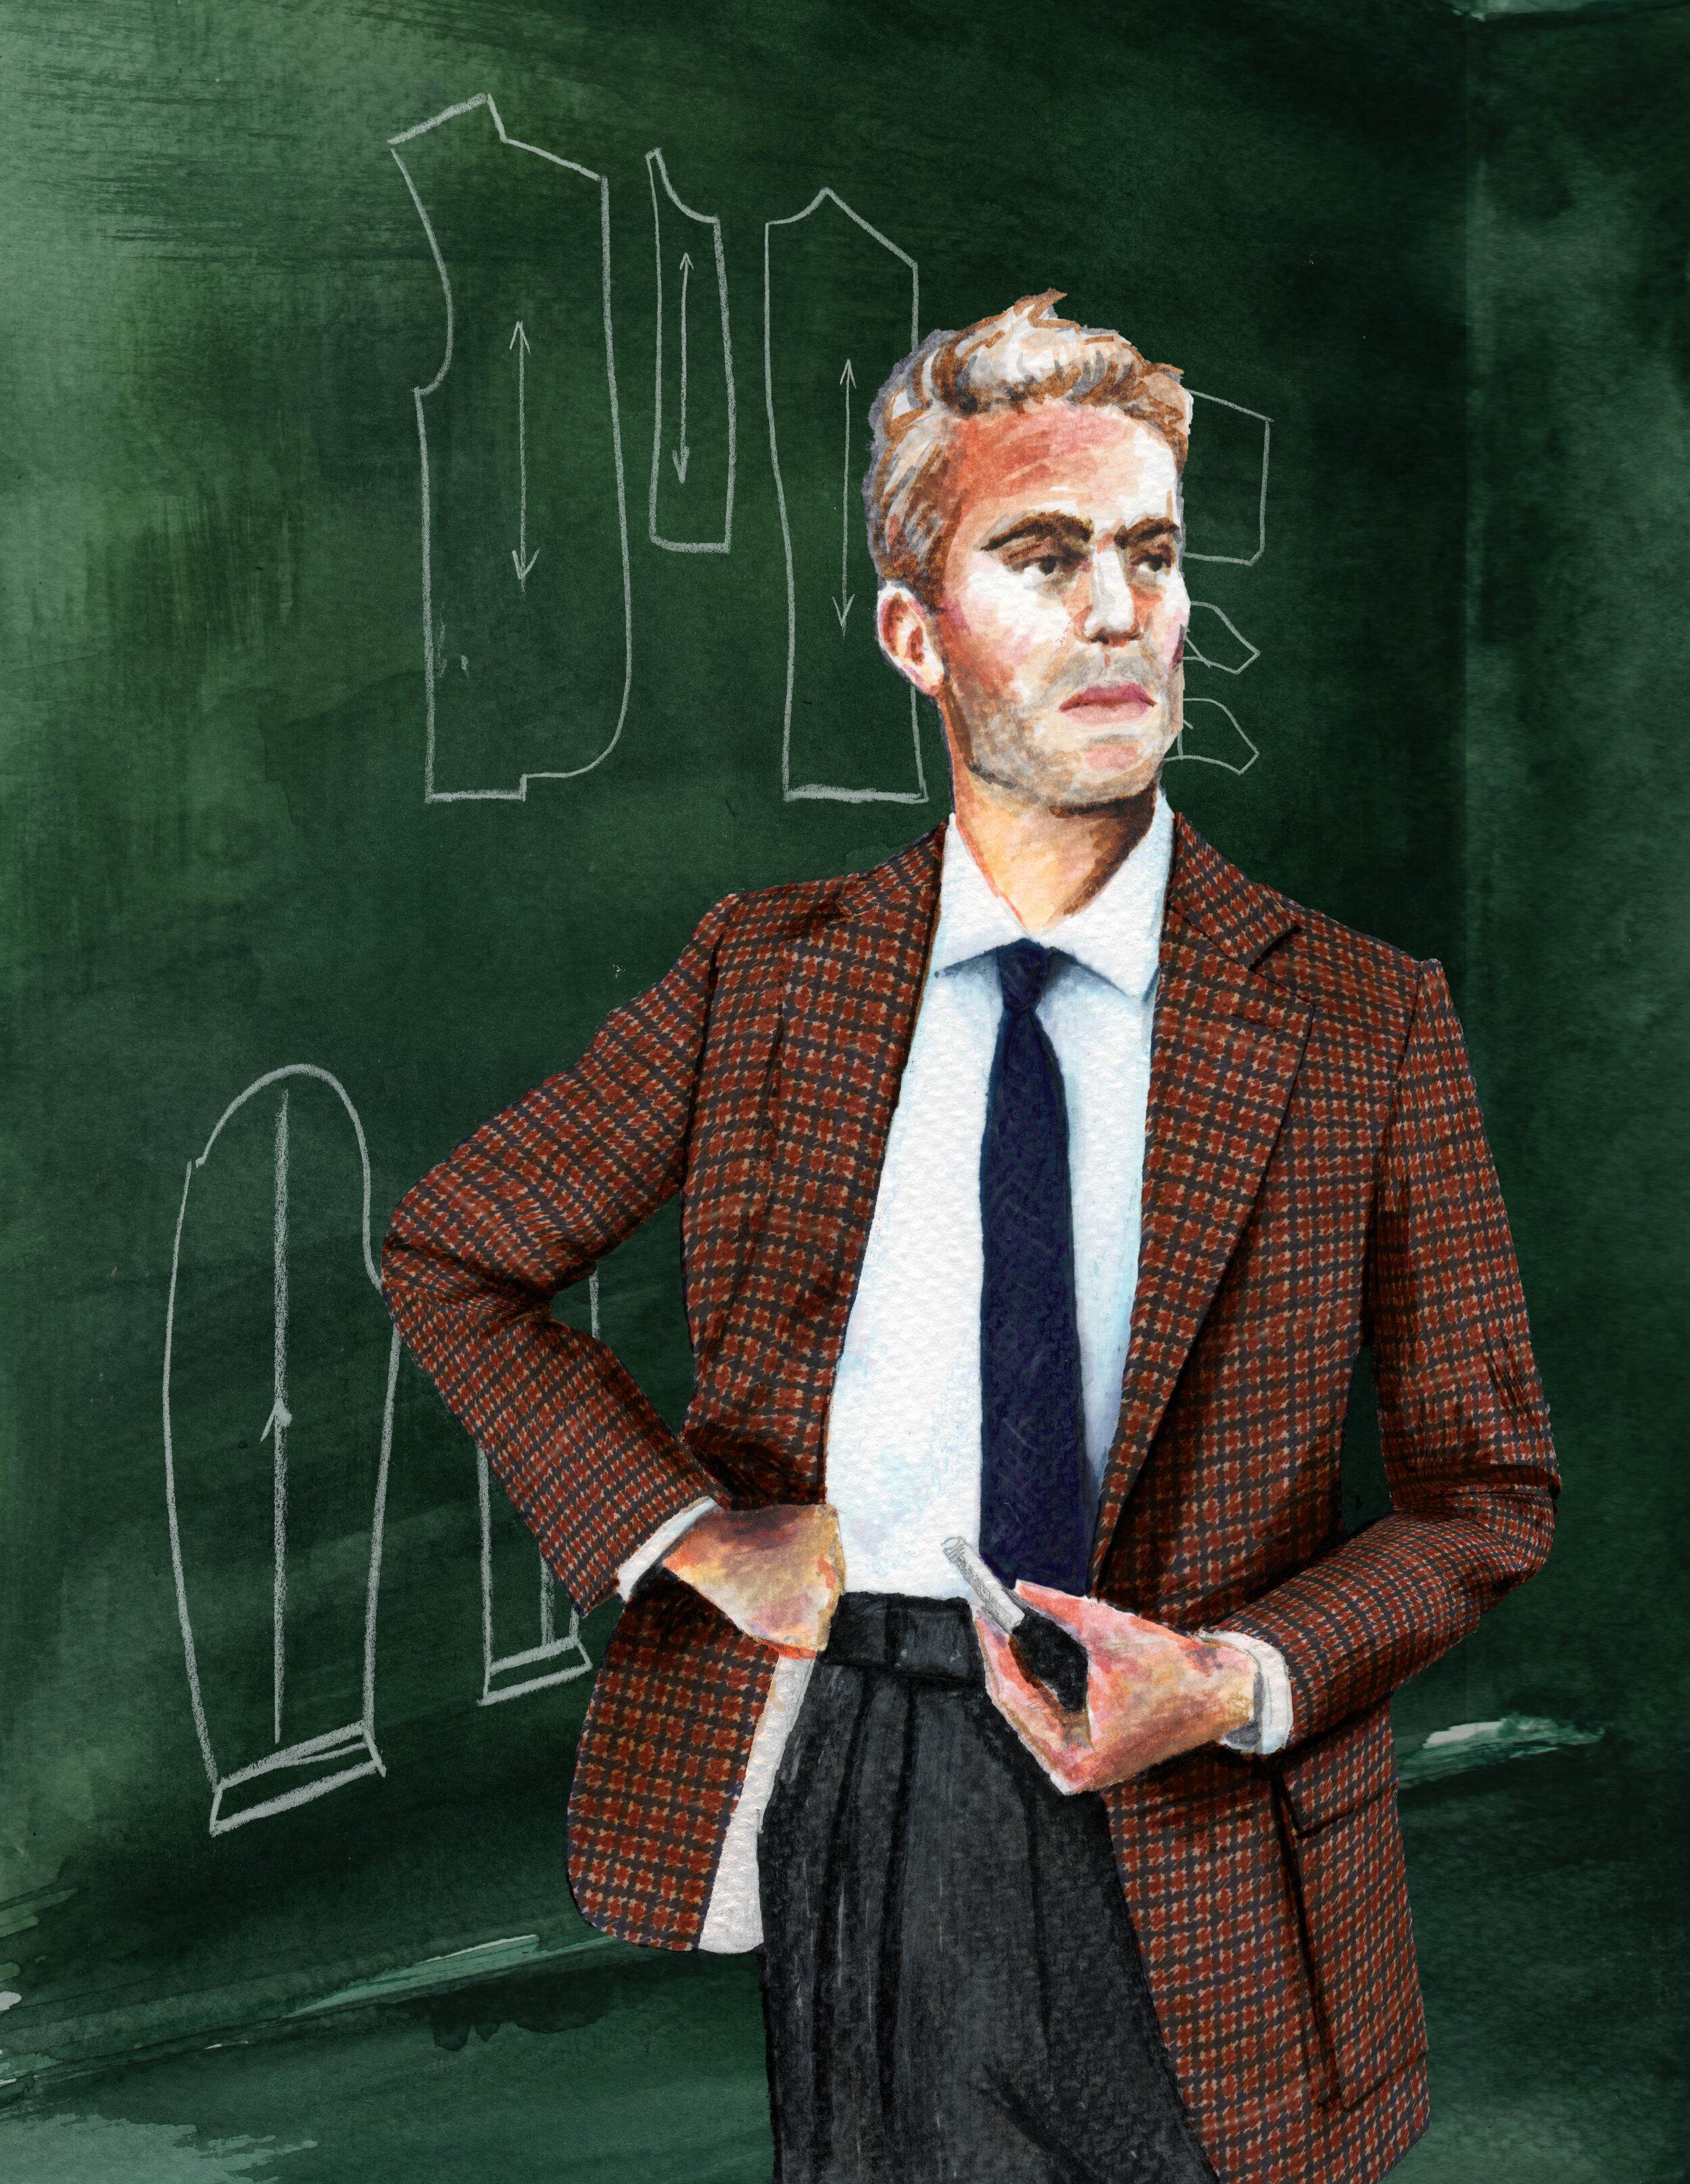 Illustration by Mark Glasgow